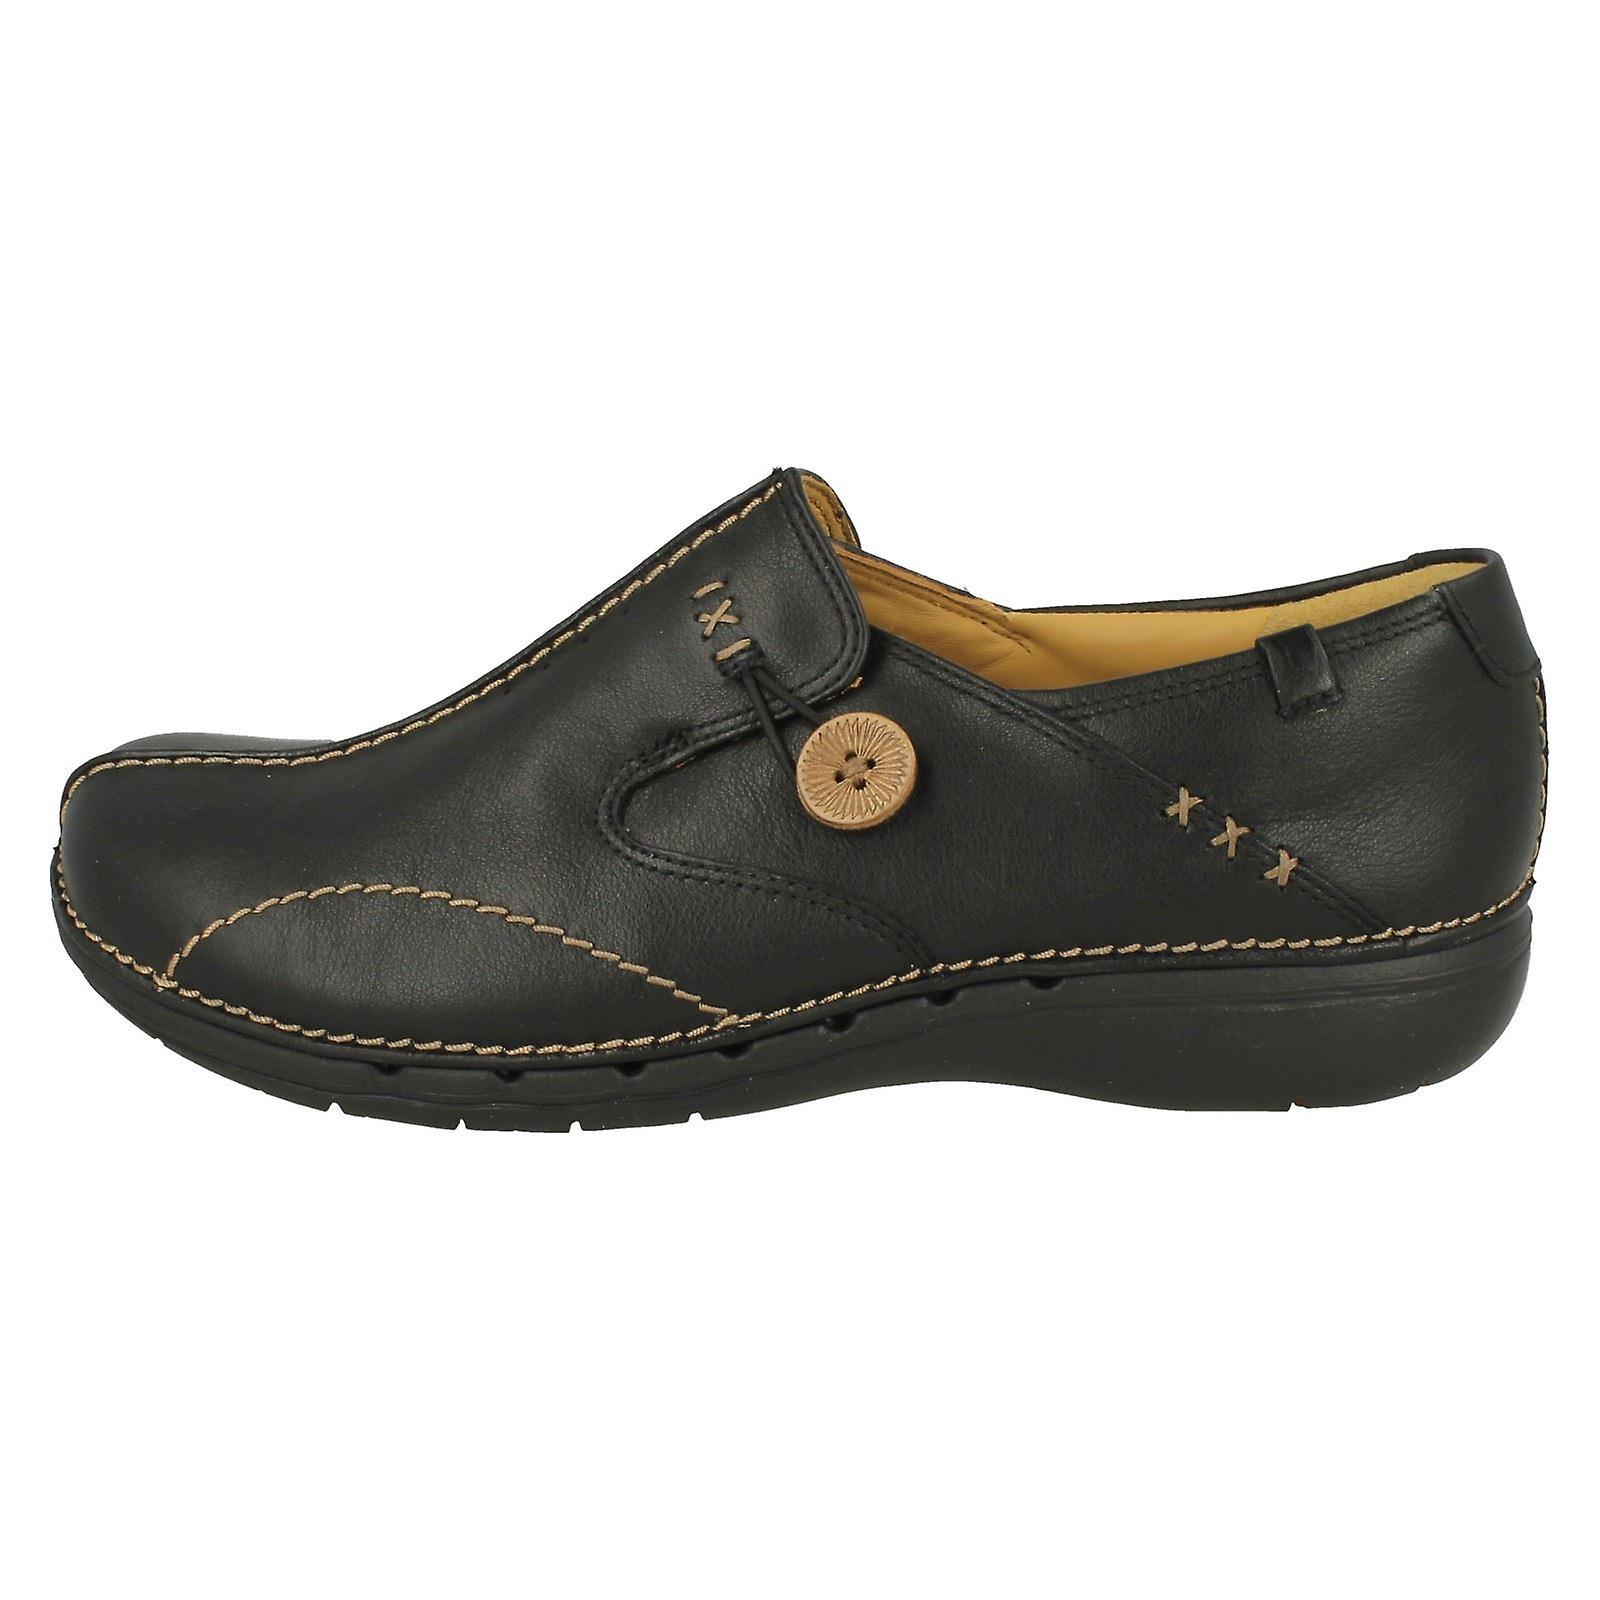 Damen Clarks Un strukturiert Slip-on Schuhe Un Loop